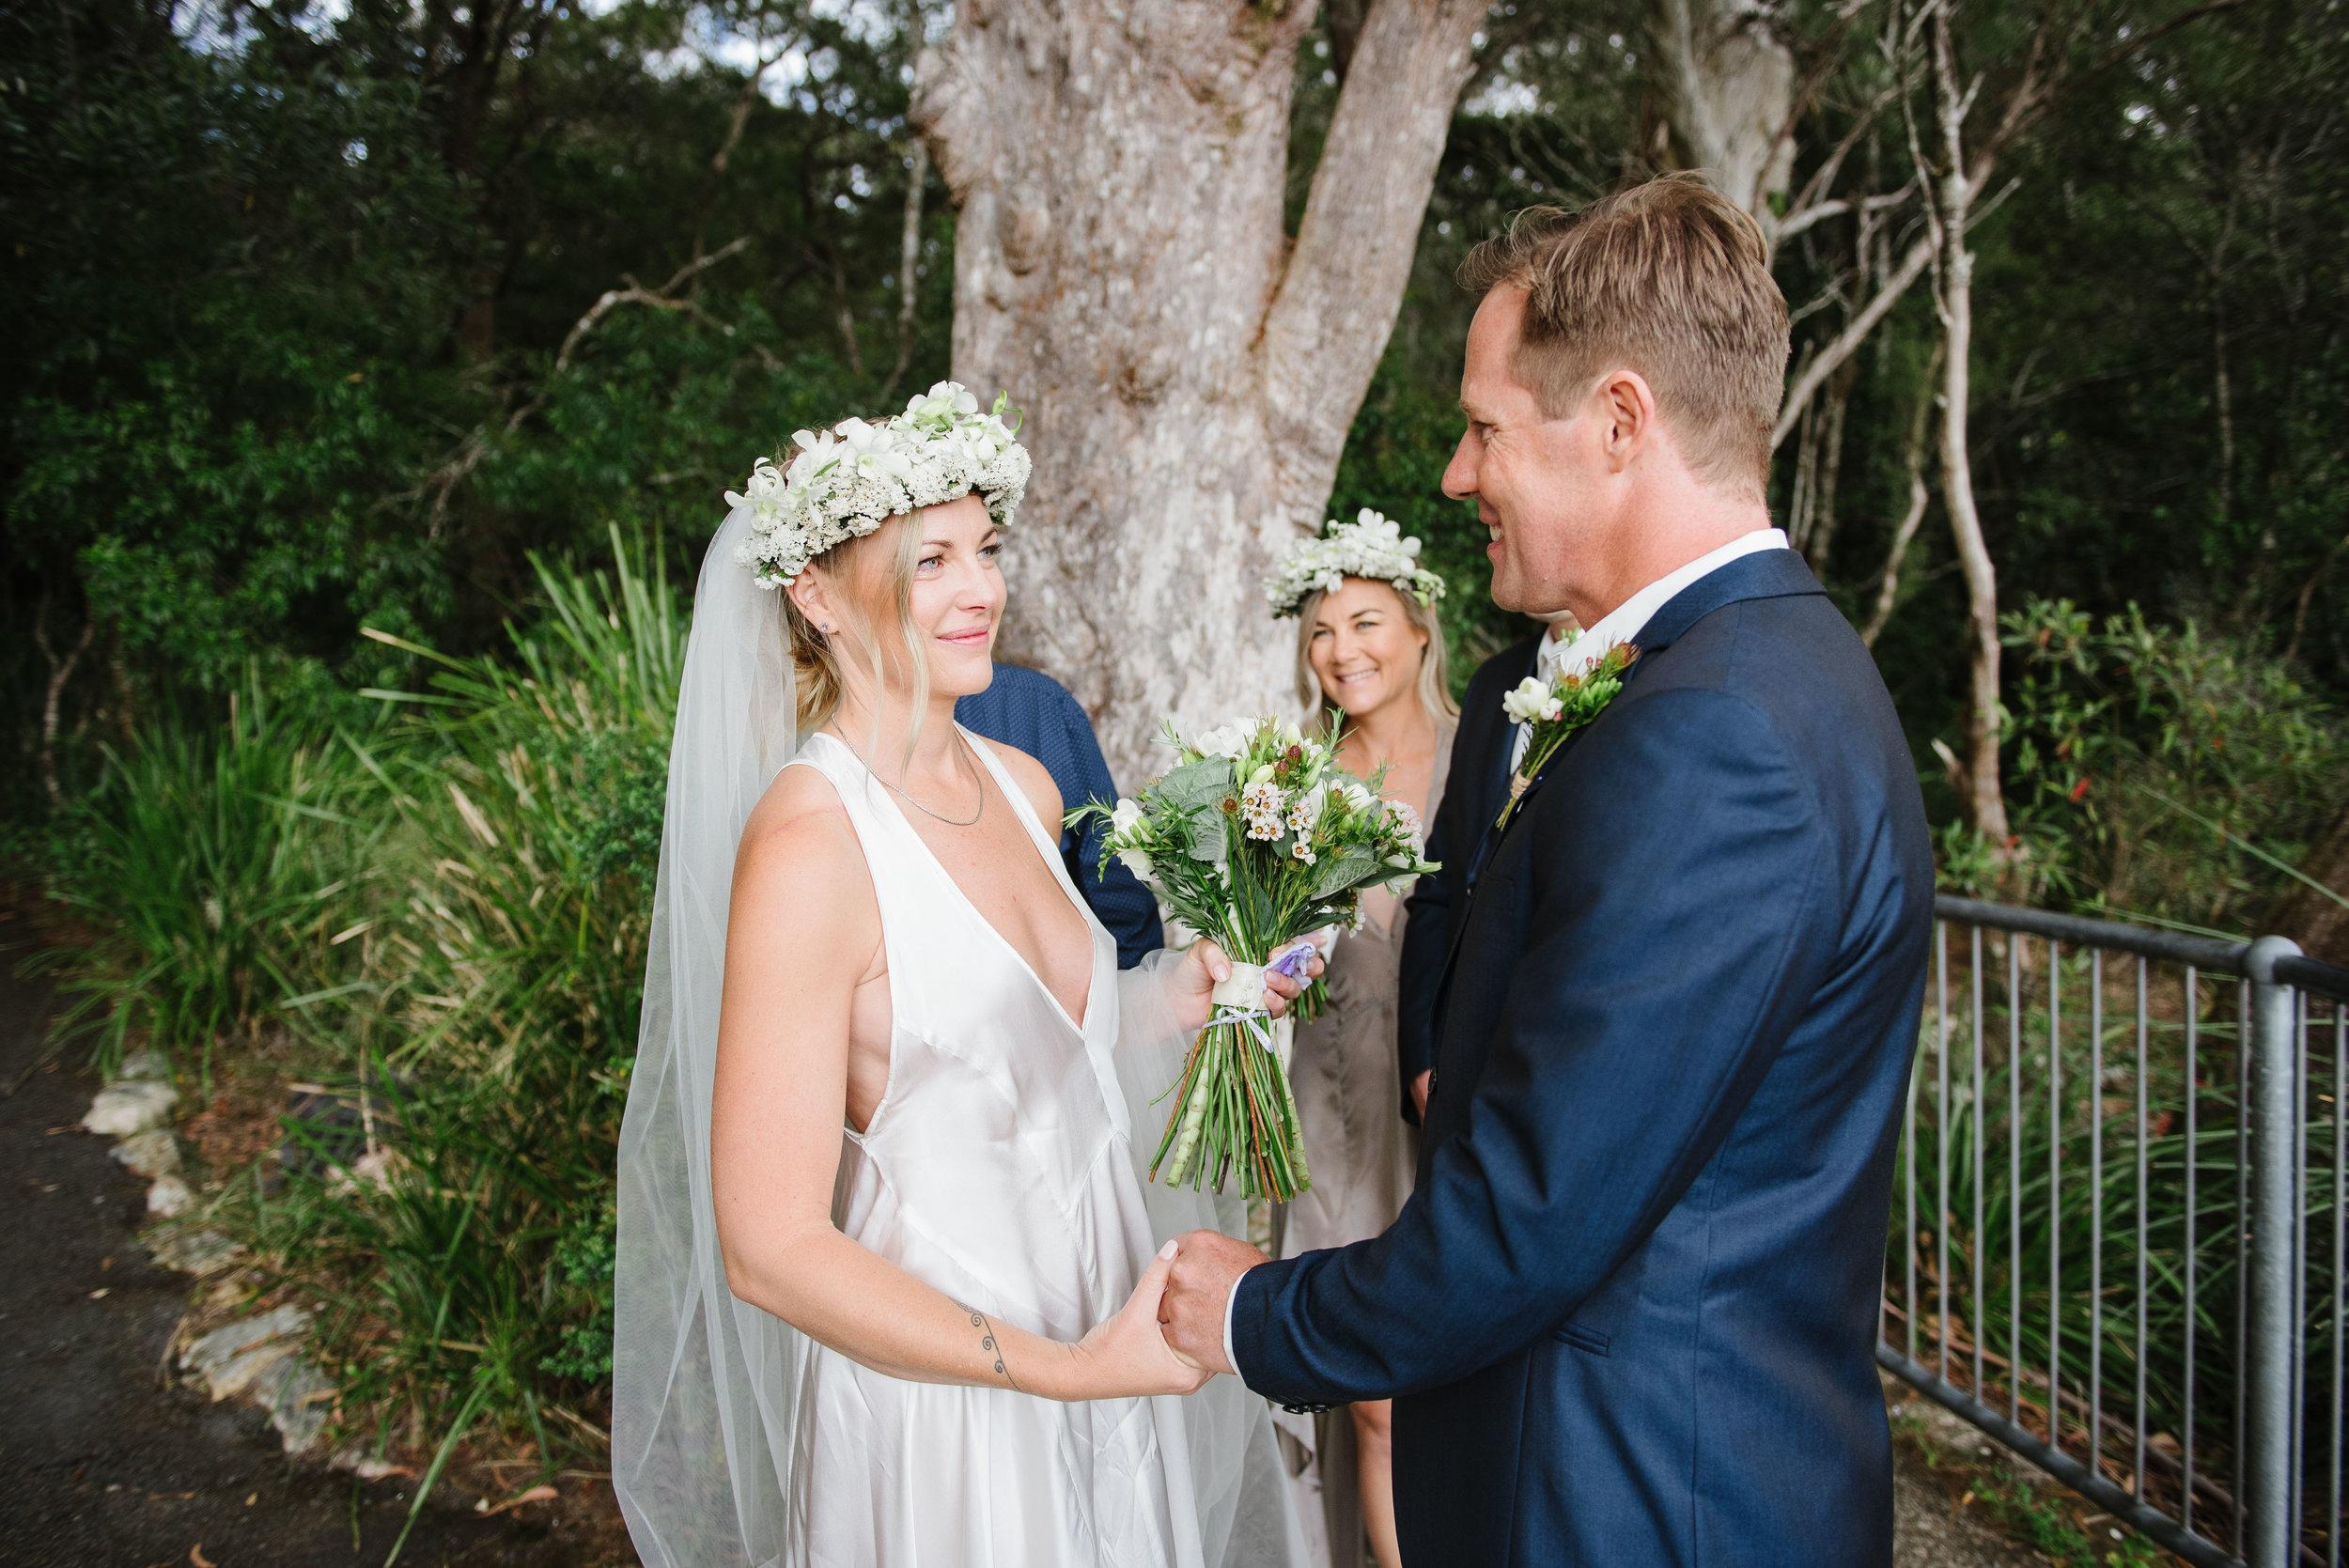 Carla and Luke- wedding photographer, byron bay wedding and family photographer, tweed heads wedding and family photography-161.jpg